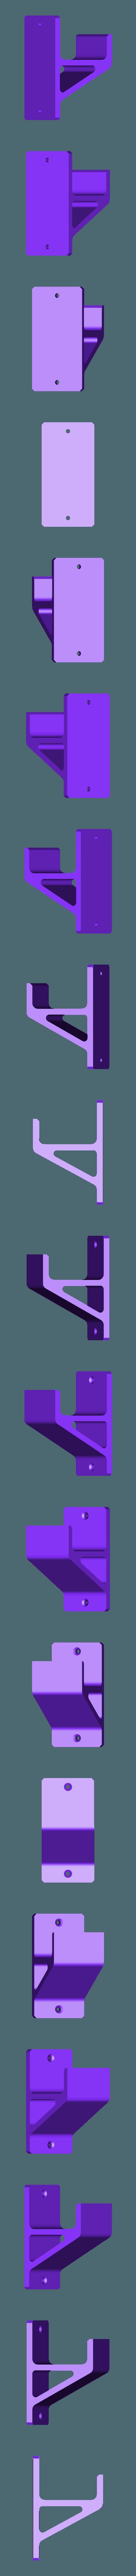 Schraubzwingehalter-gross.STL Descargar archivo STL gratis Schraubzwingenhalter / Soporte de abrazadera de tornillo • Diseño para imprimir en 3D, Chileo